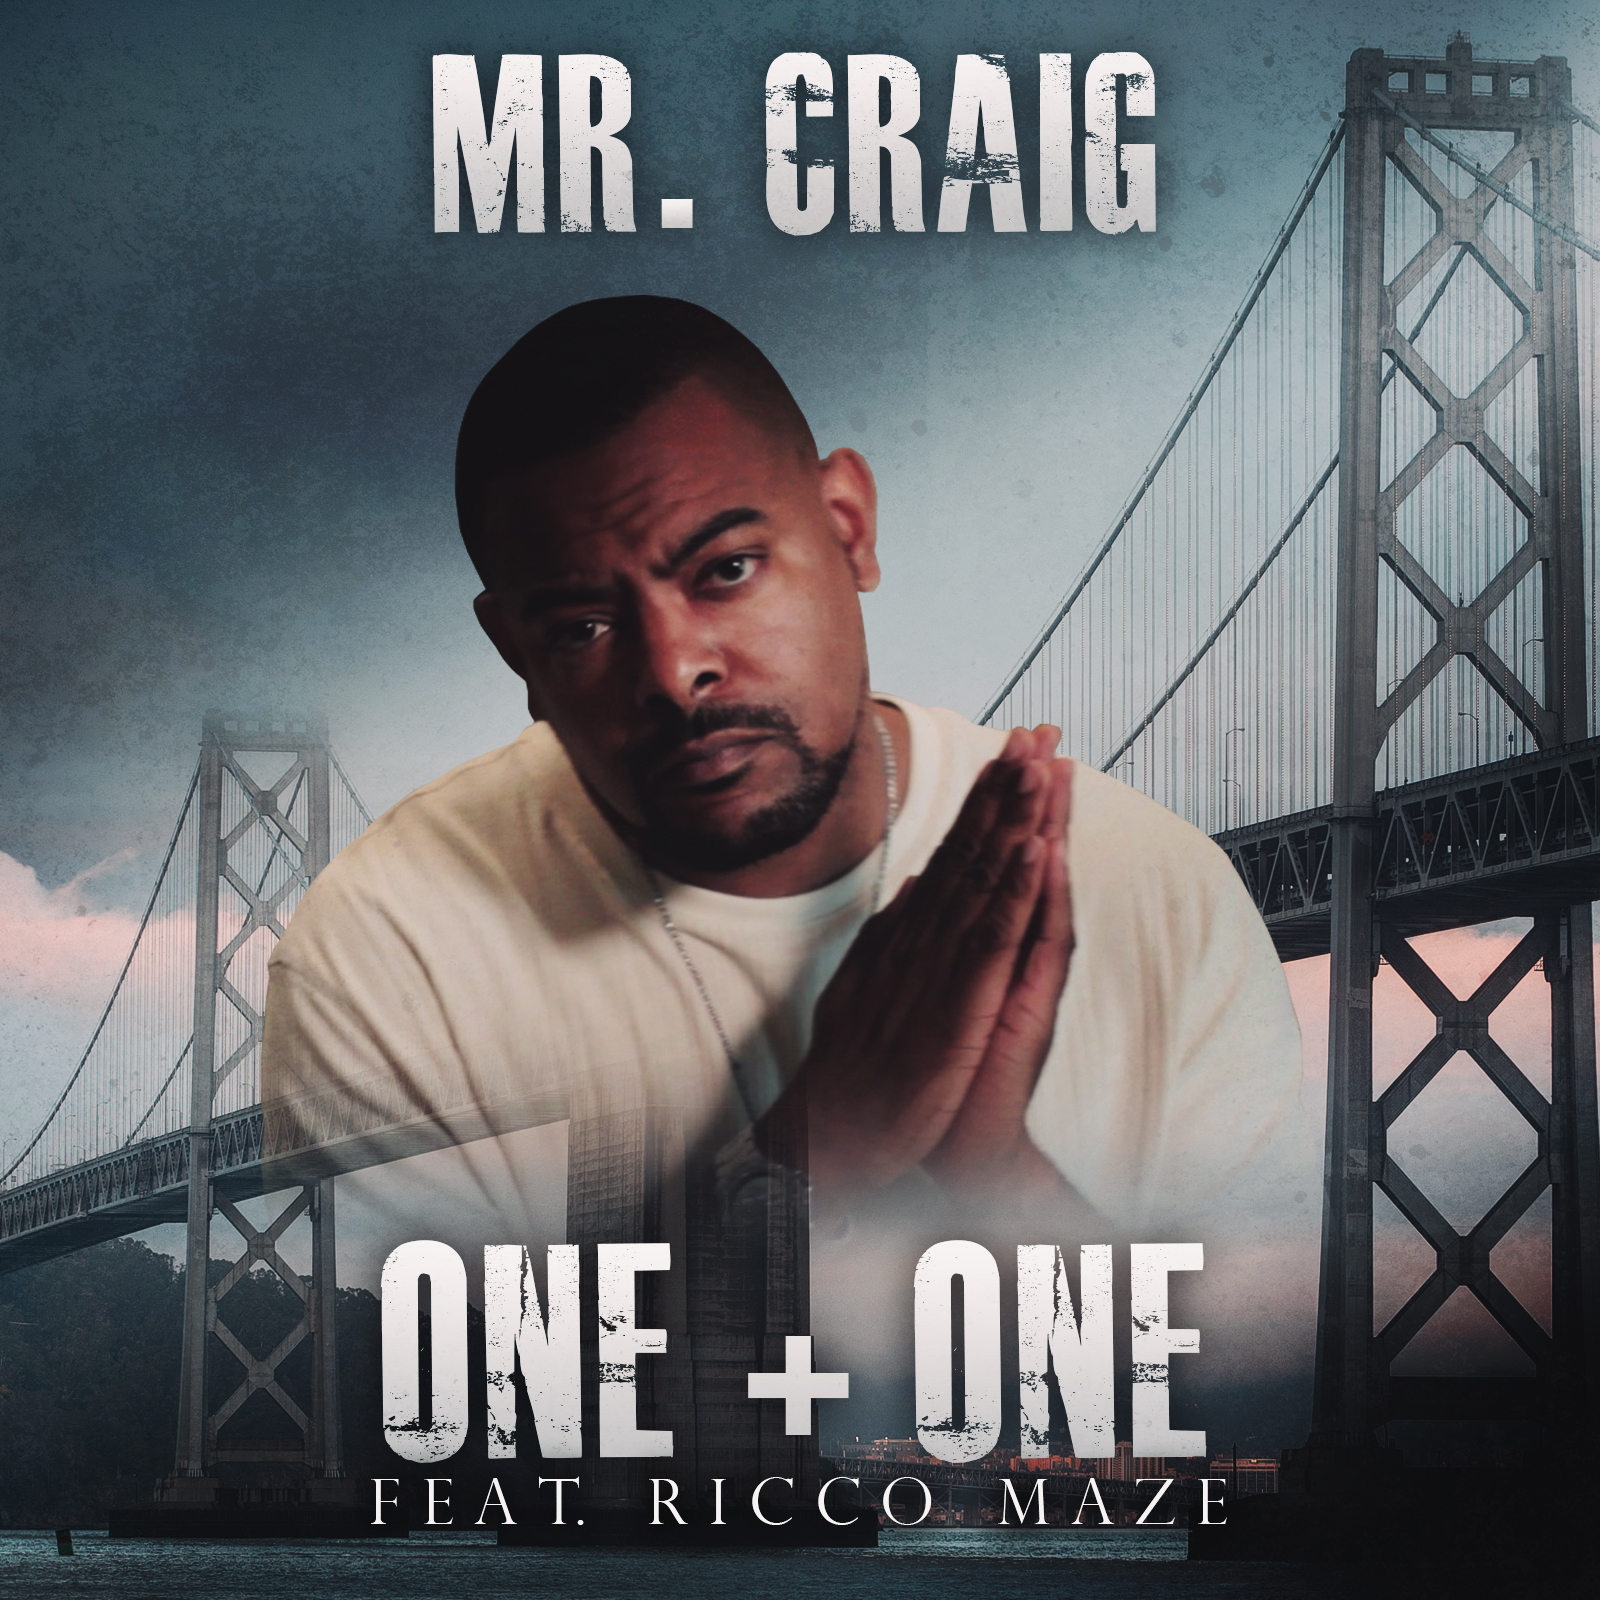 Mr. Craig – One + One